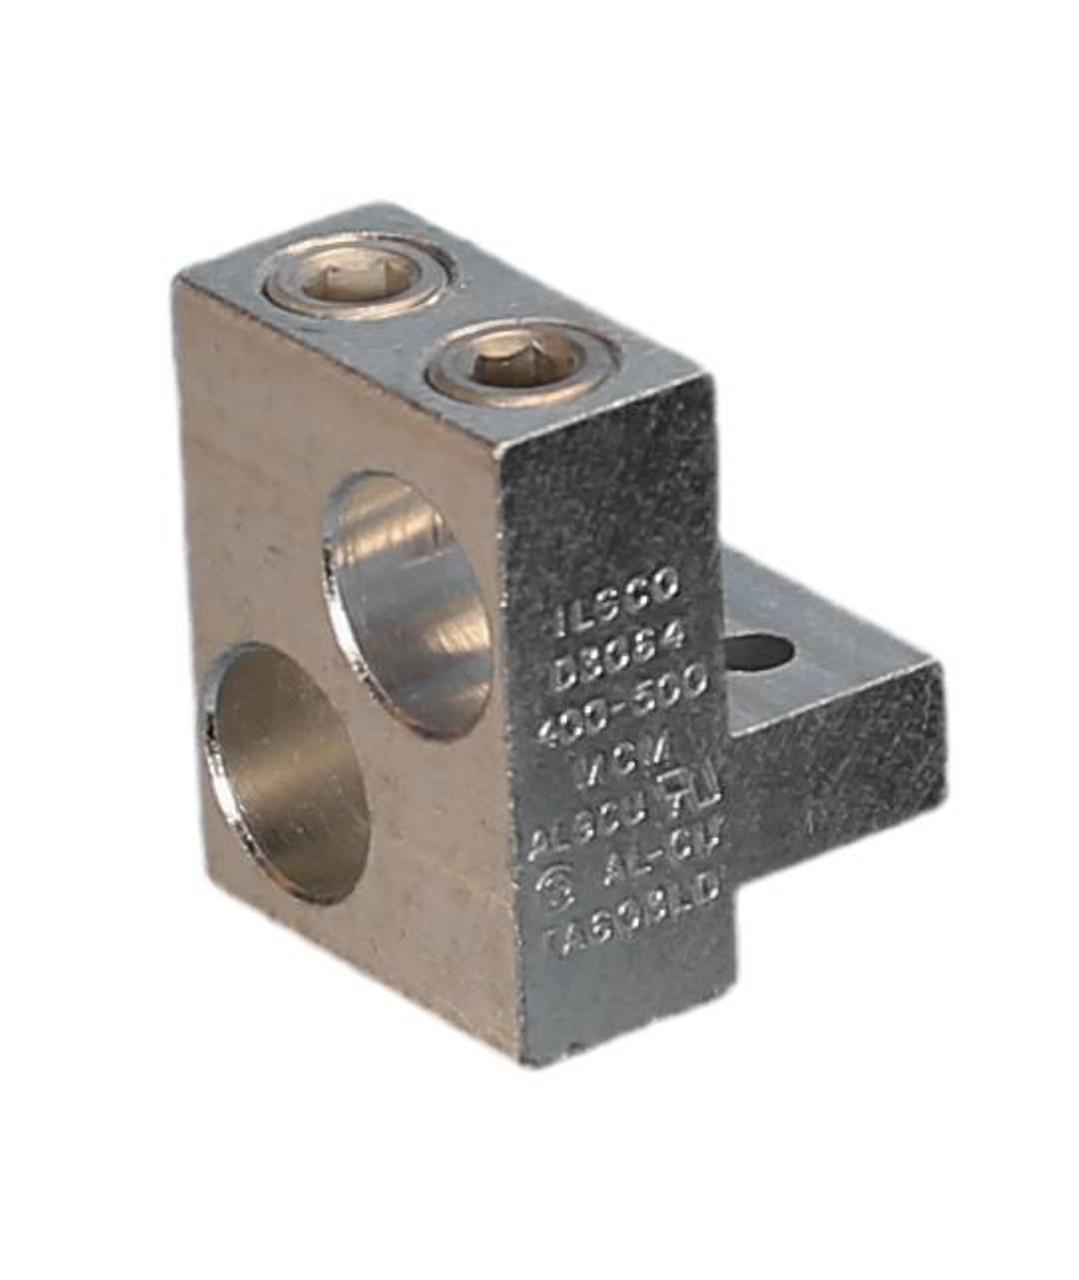 3TA603LDK Close view of Lug, Pk/3 Lugs and Shield